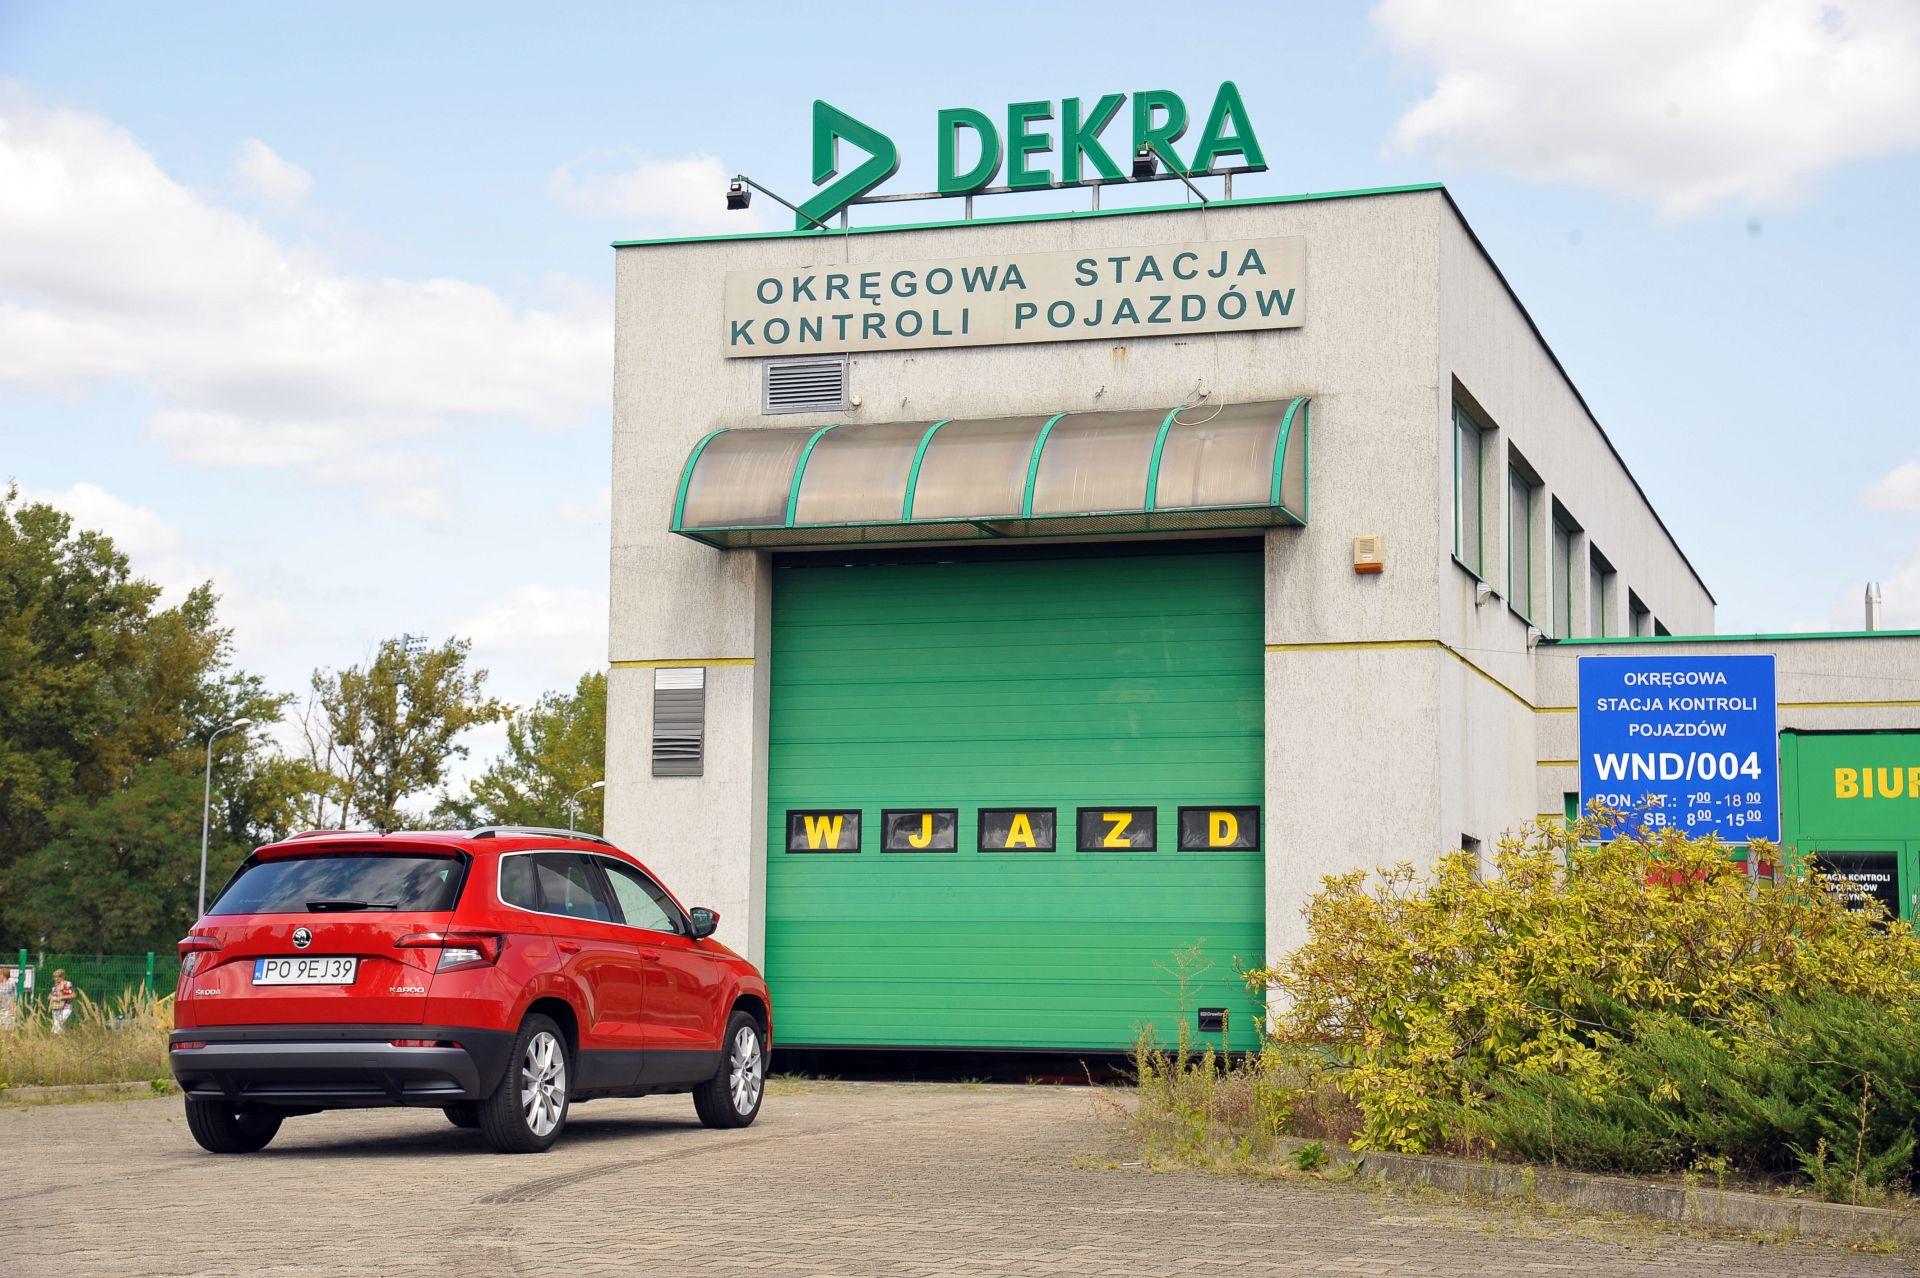 Skoda Karoq - DEKRA